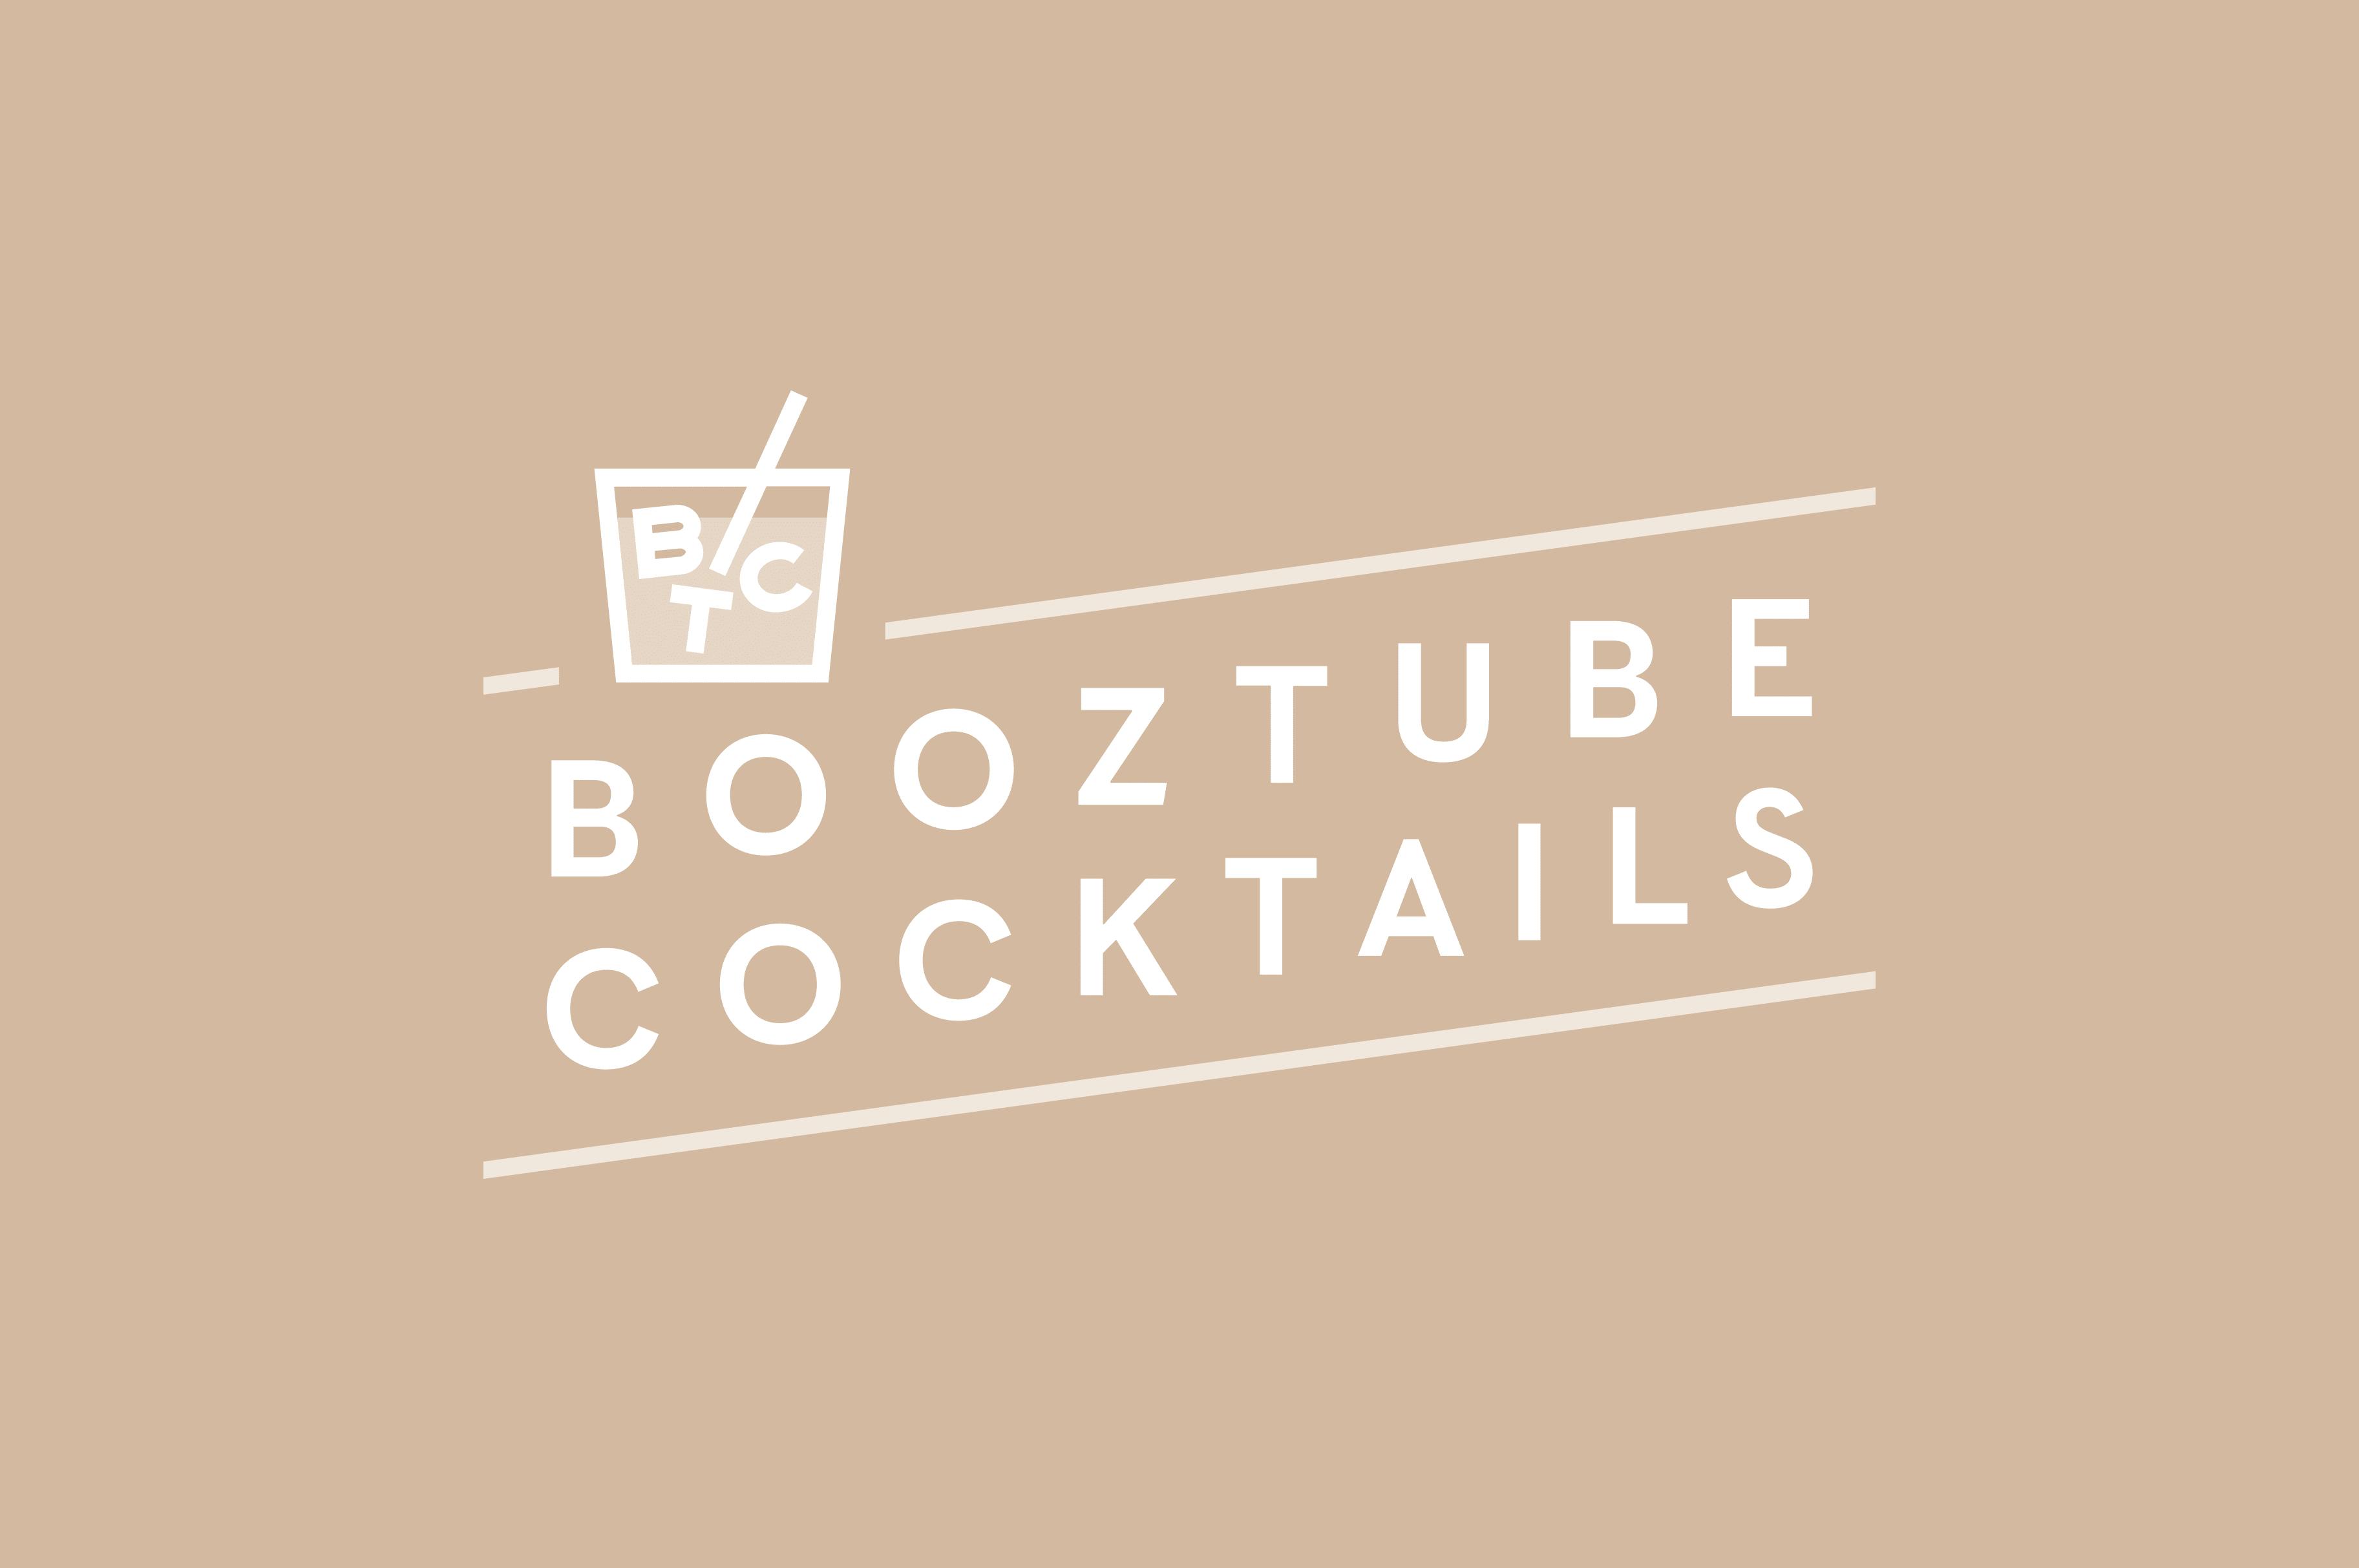 Booztube cocktails logo